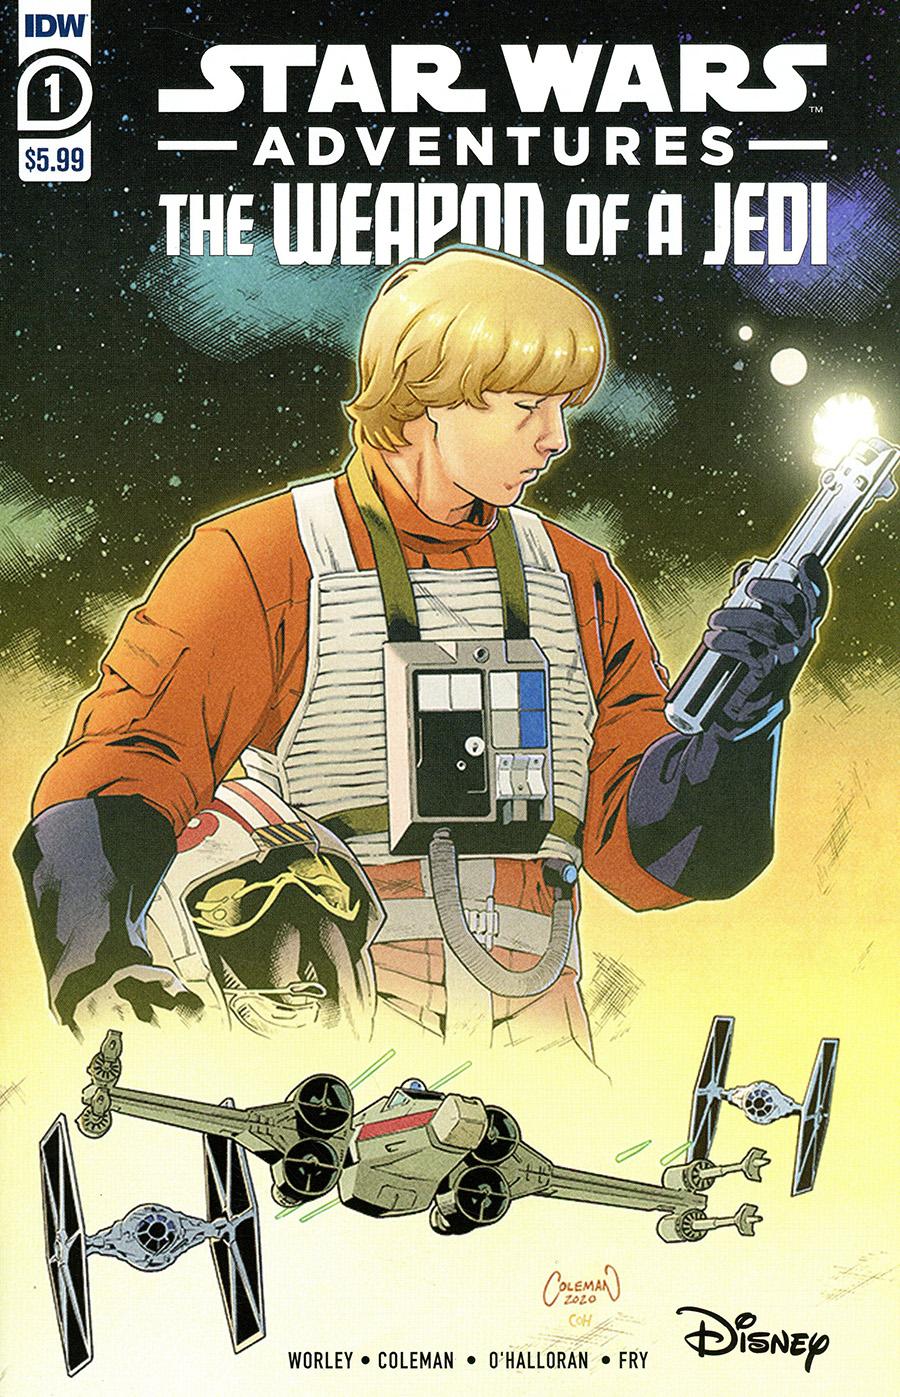 Star Wars Adventures Weapon Of A Jedi #1